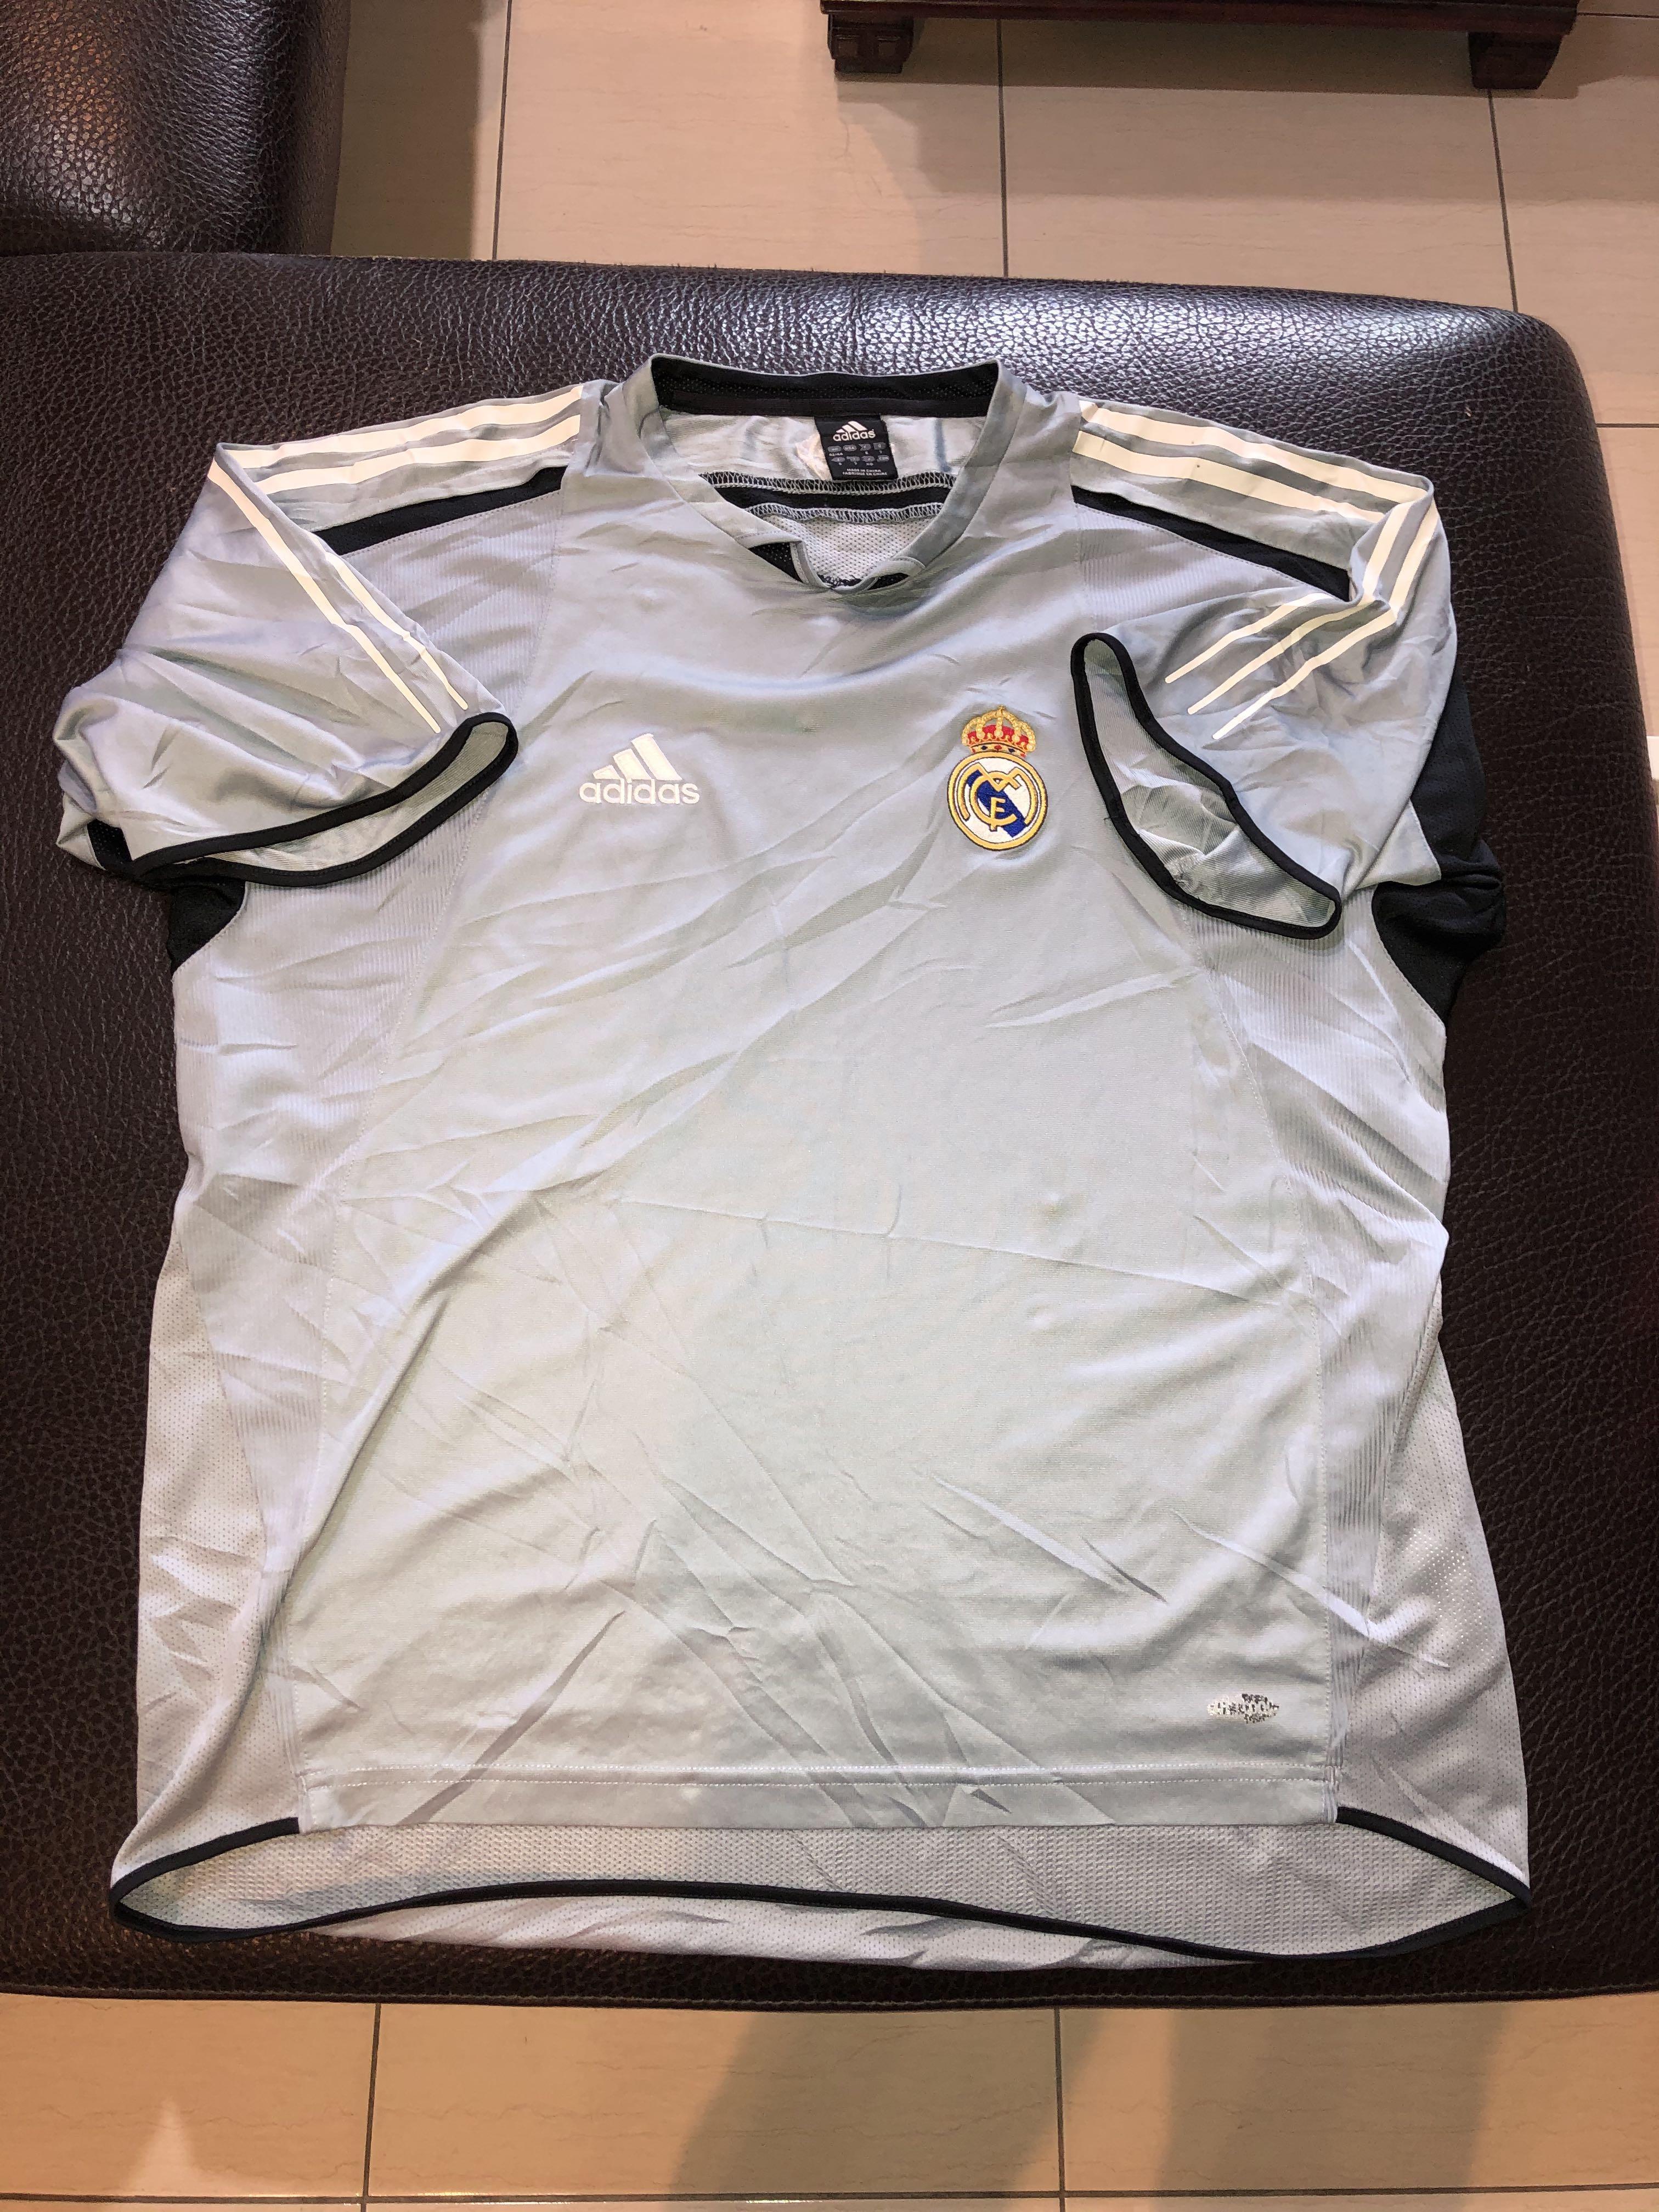 Adidas 足球衣(尺碼42/44)